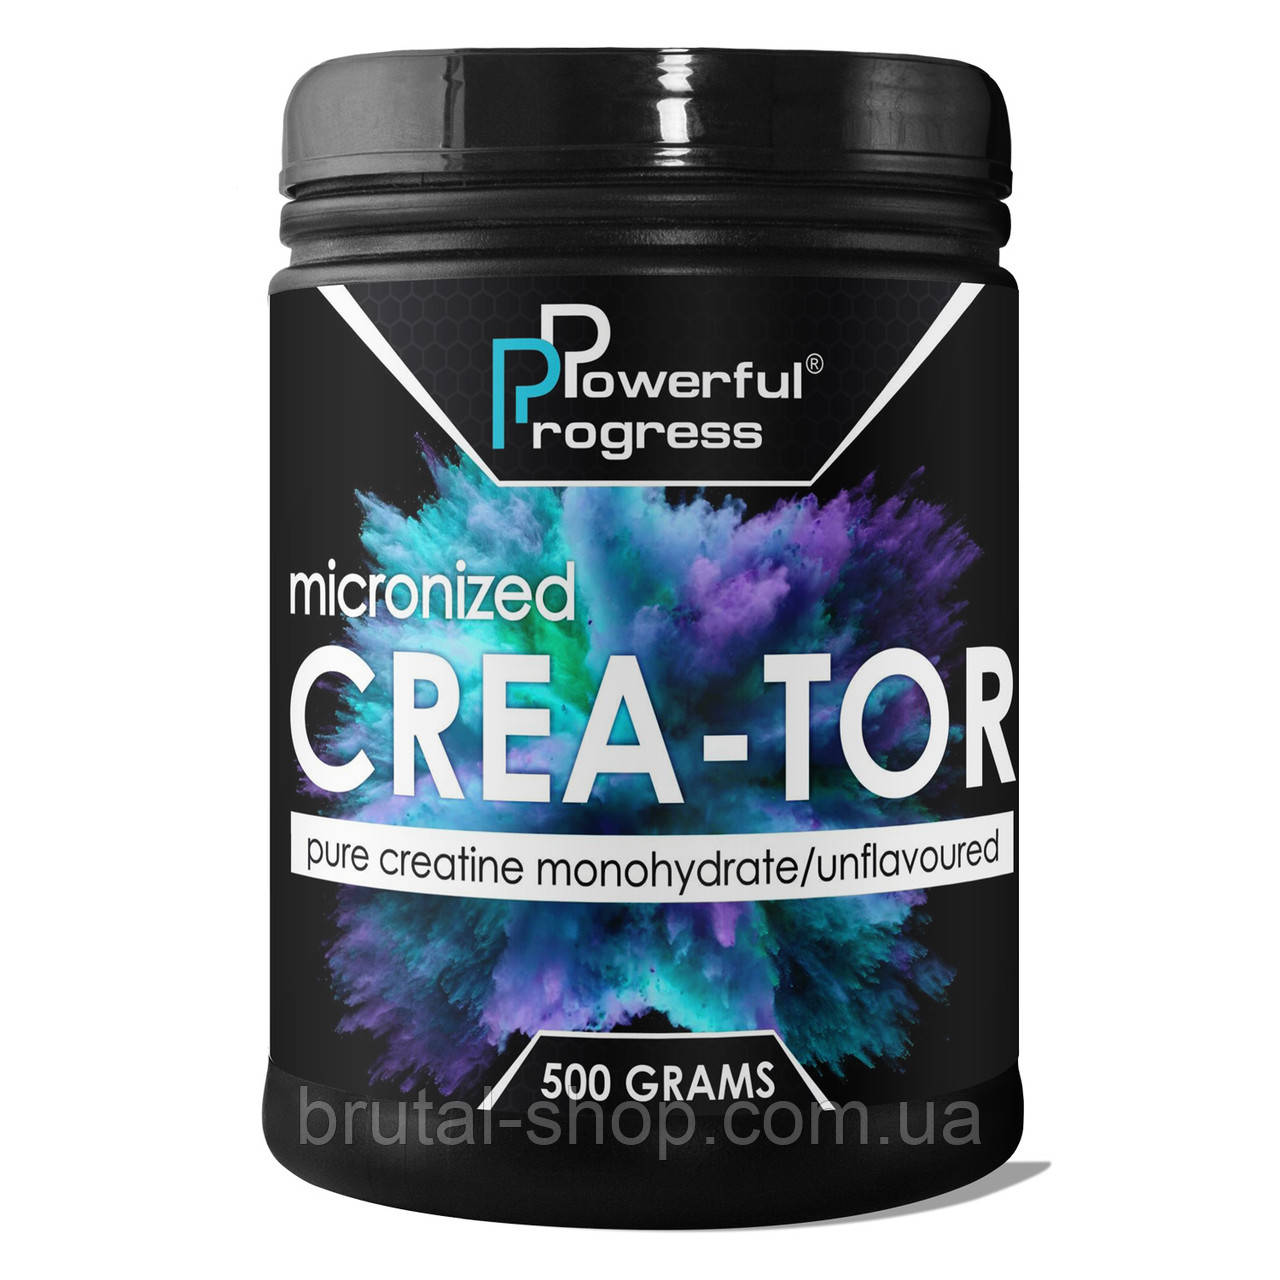 Креатин Powerful Progress Crea-Tor Micronized (500g)